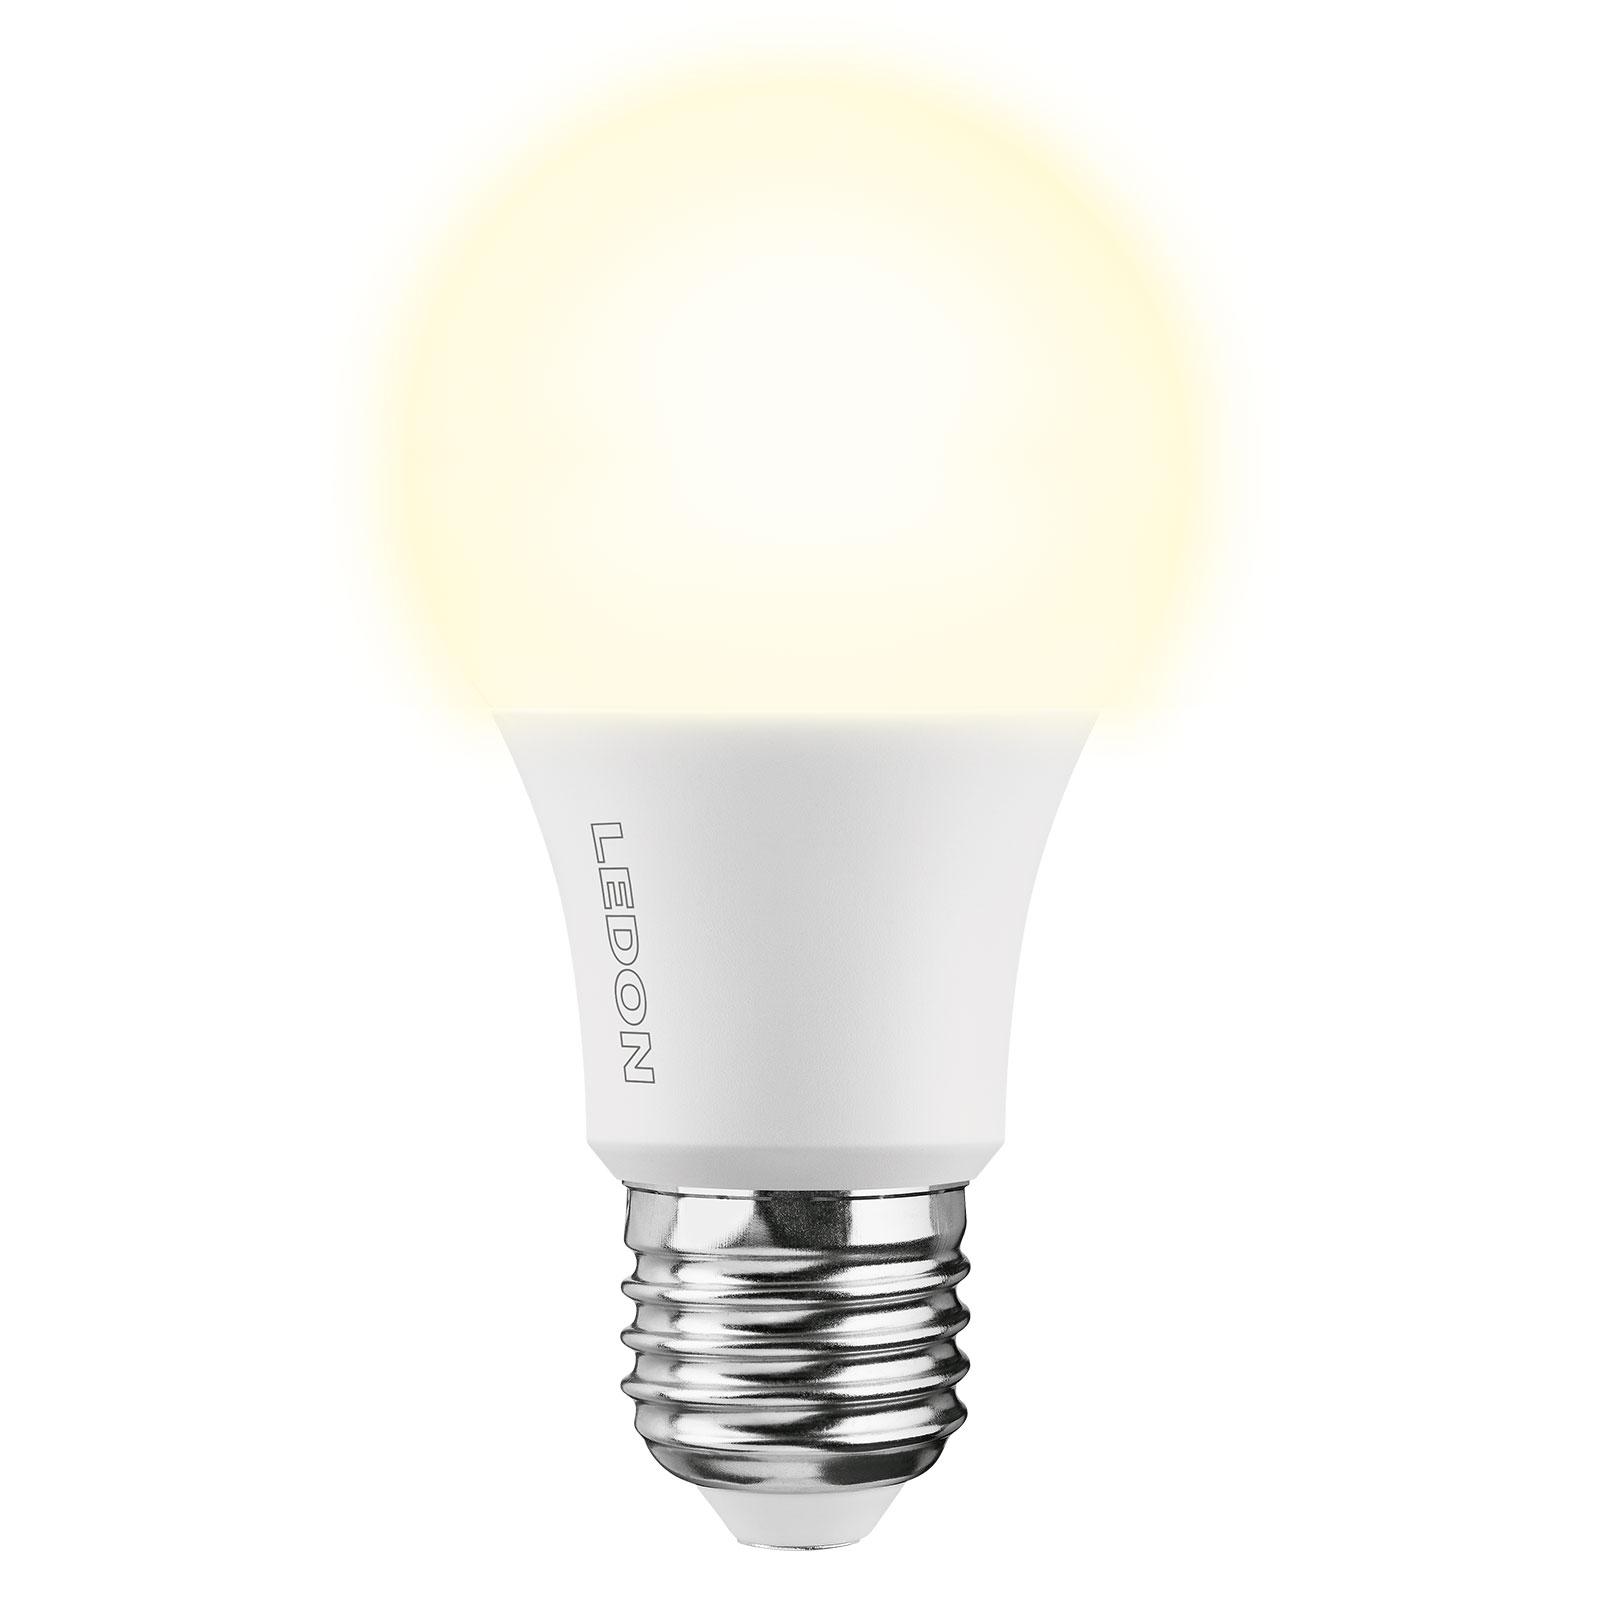 LED-Lampe E27 9,5W, warmweiß 927, nicht dimmbar